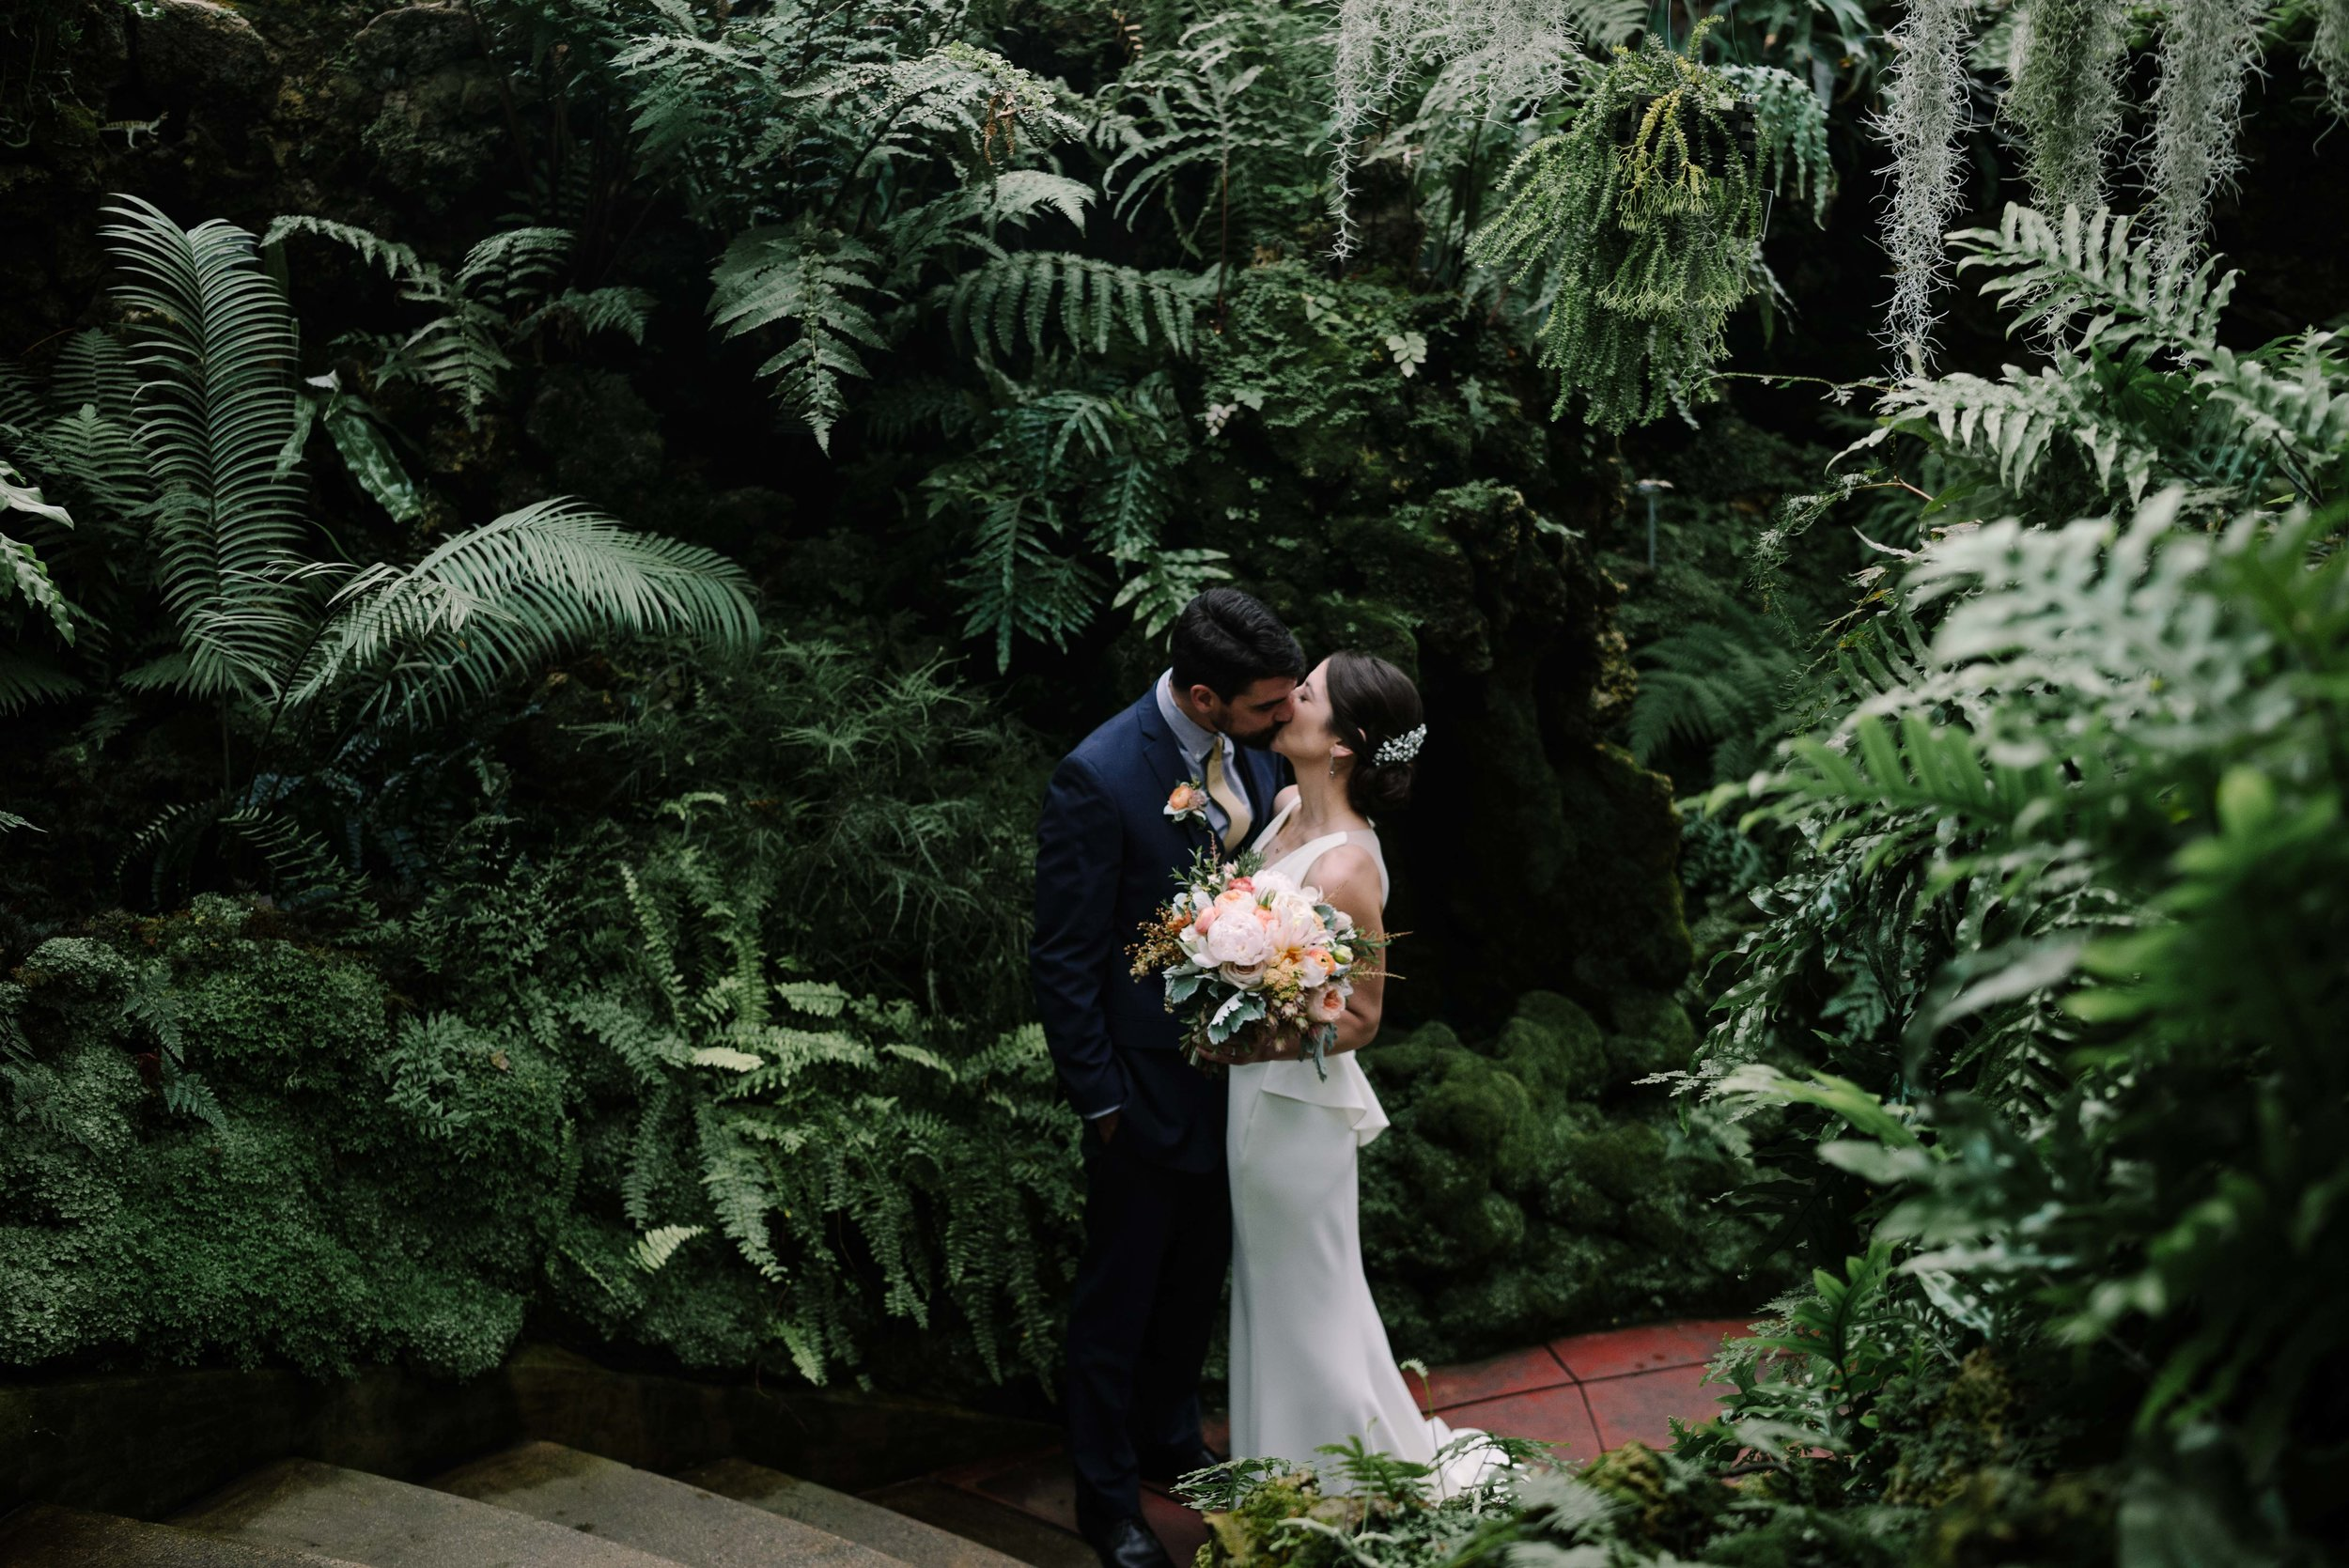 Patricia-Steve-Blog-Indianapolis-Wedding-33.jpg